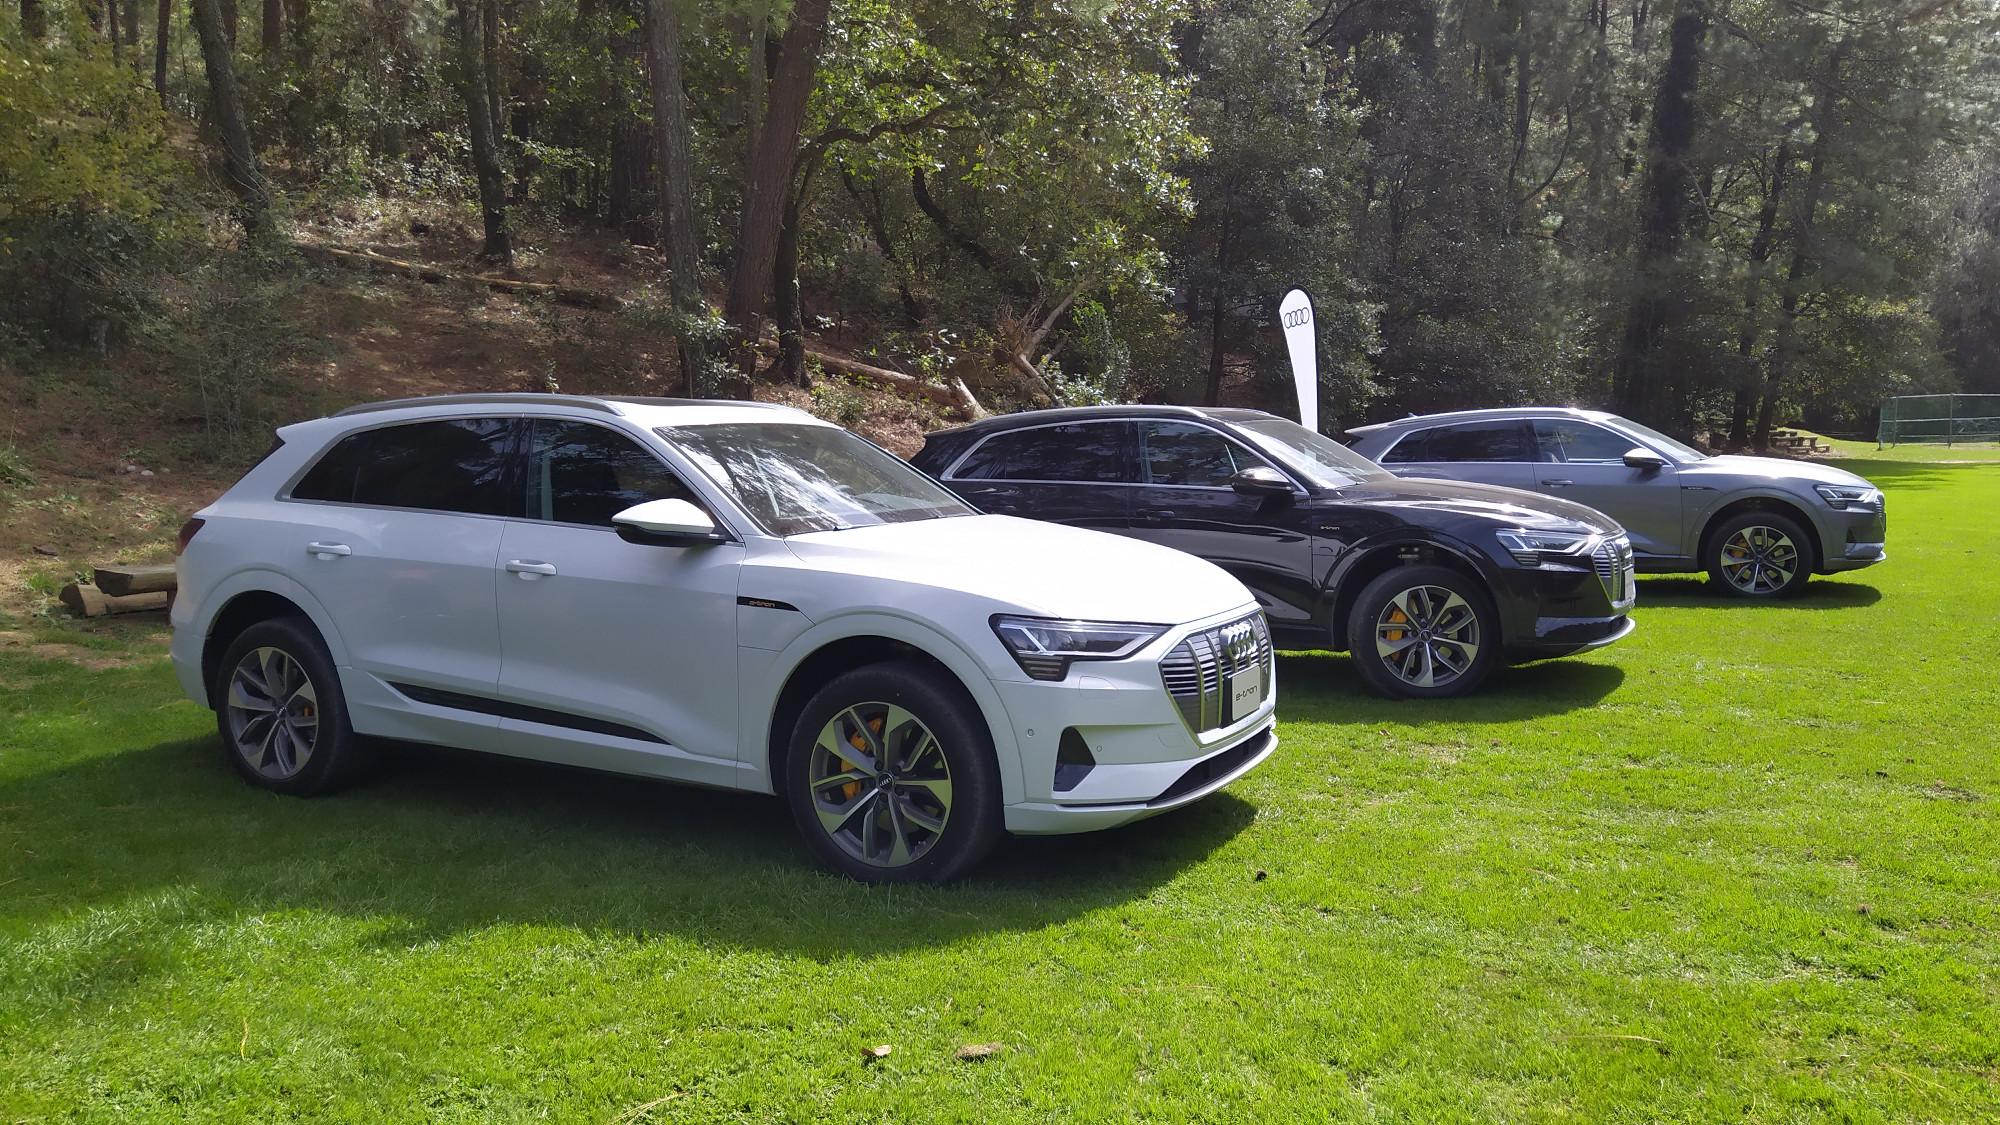 Resumen 2019: Audi e-Tron el primer eléctrico de la firma